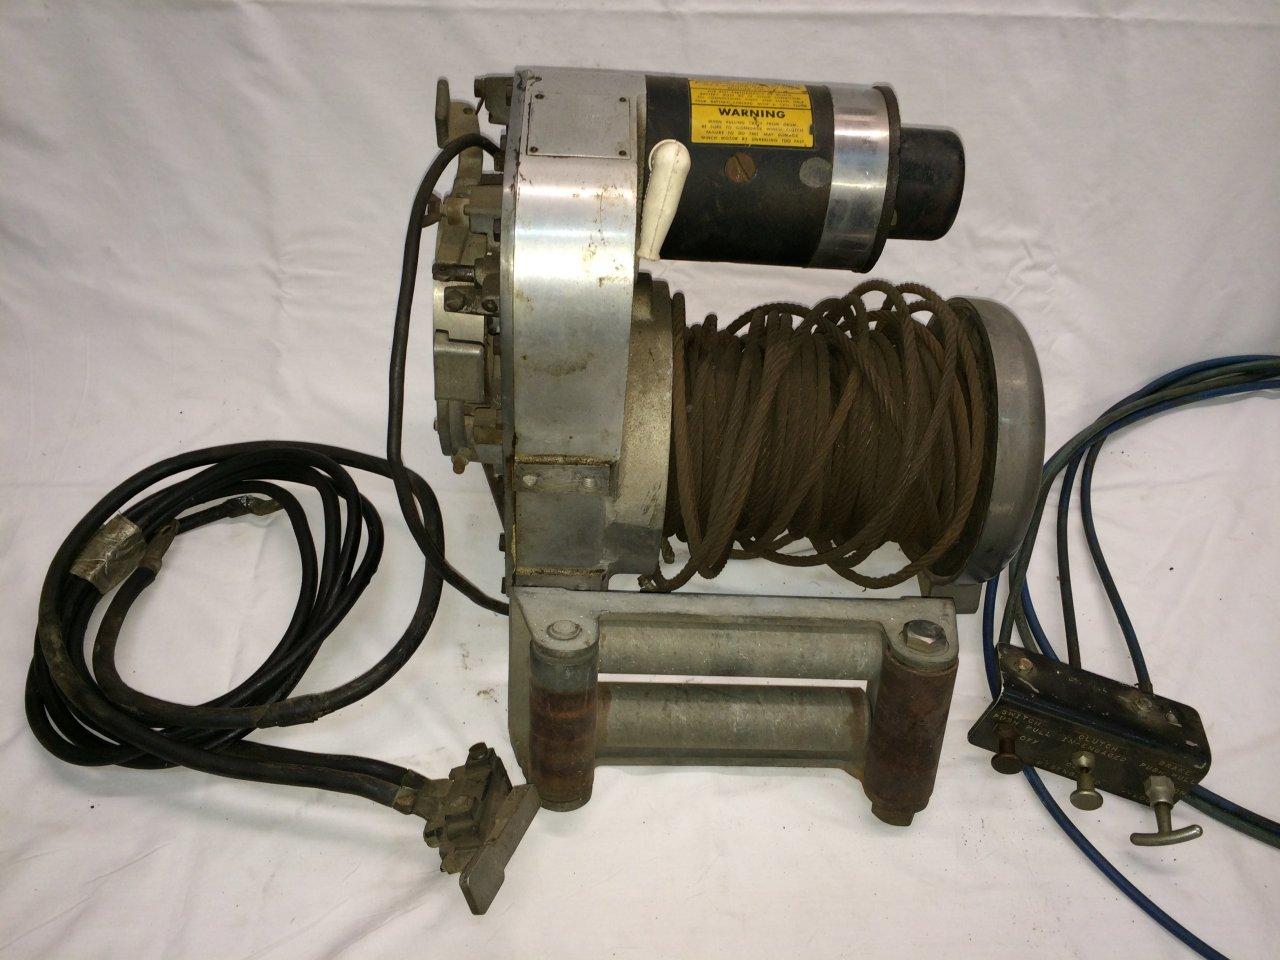 for sale belleview (warn) winch socal ih8mud forum Warn Winch Controller Wiring Diagram img_0159